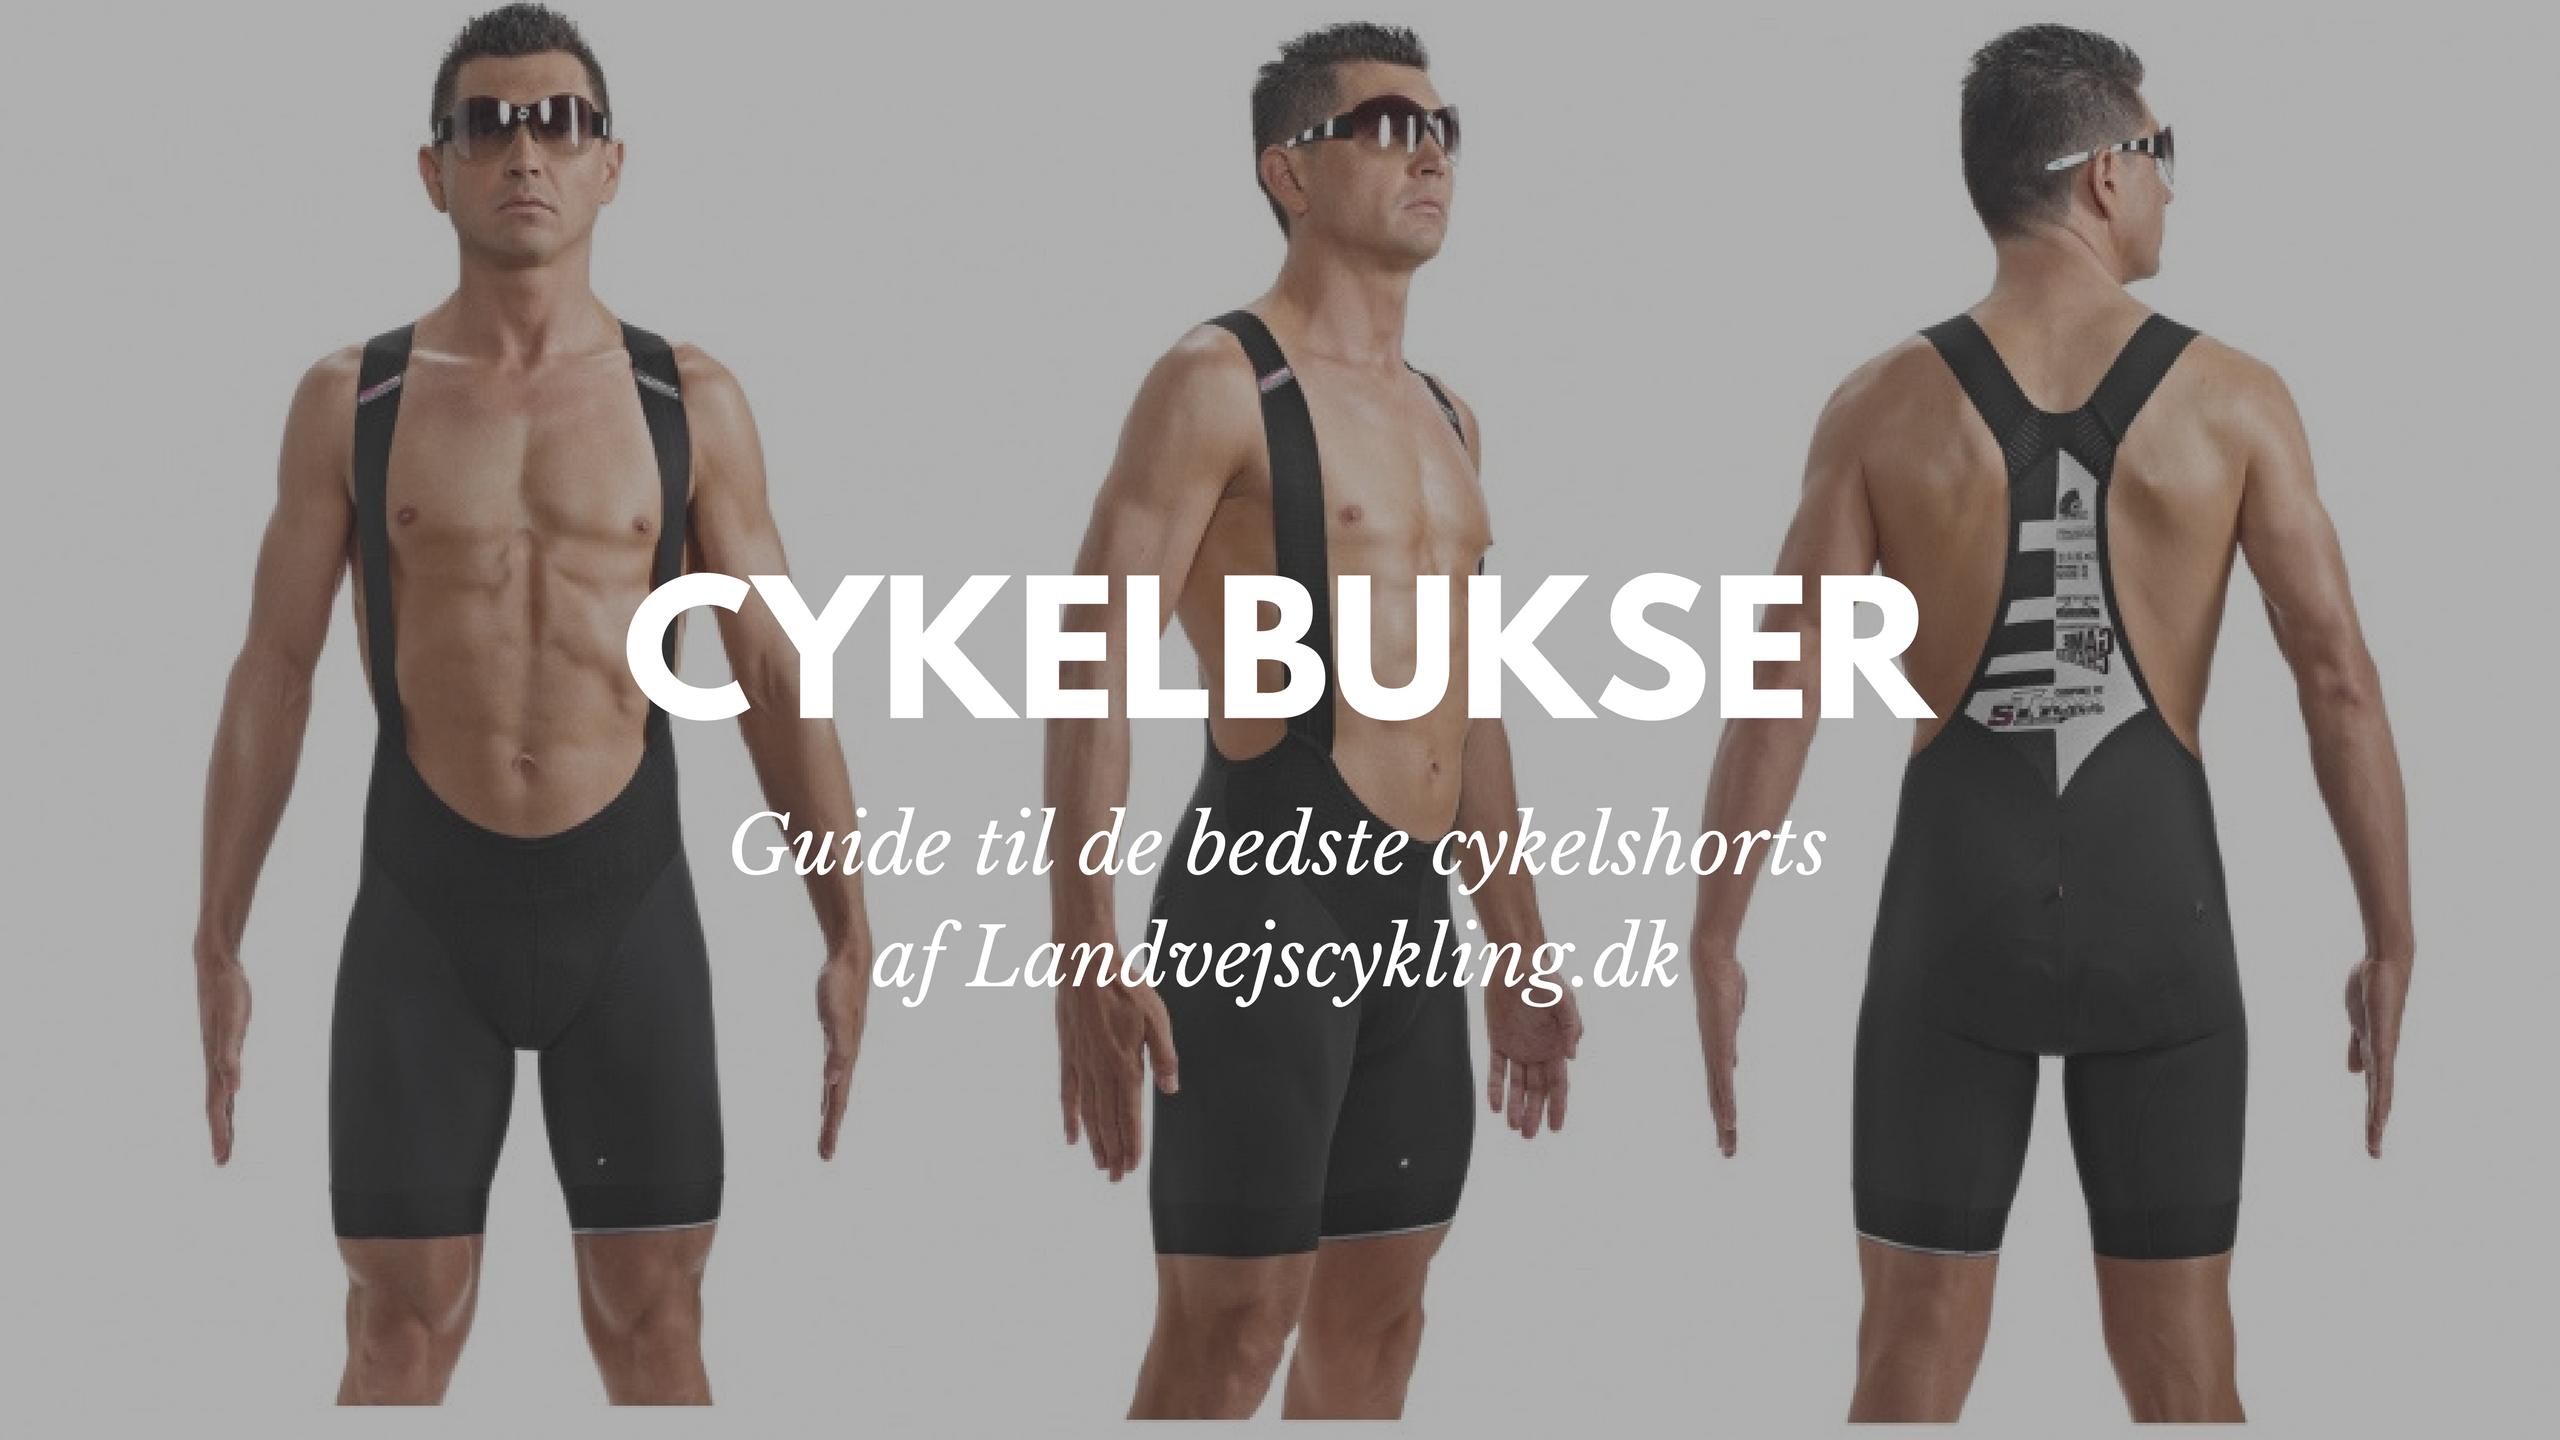 guide til de bedste cykelbukser